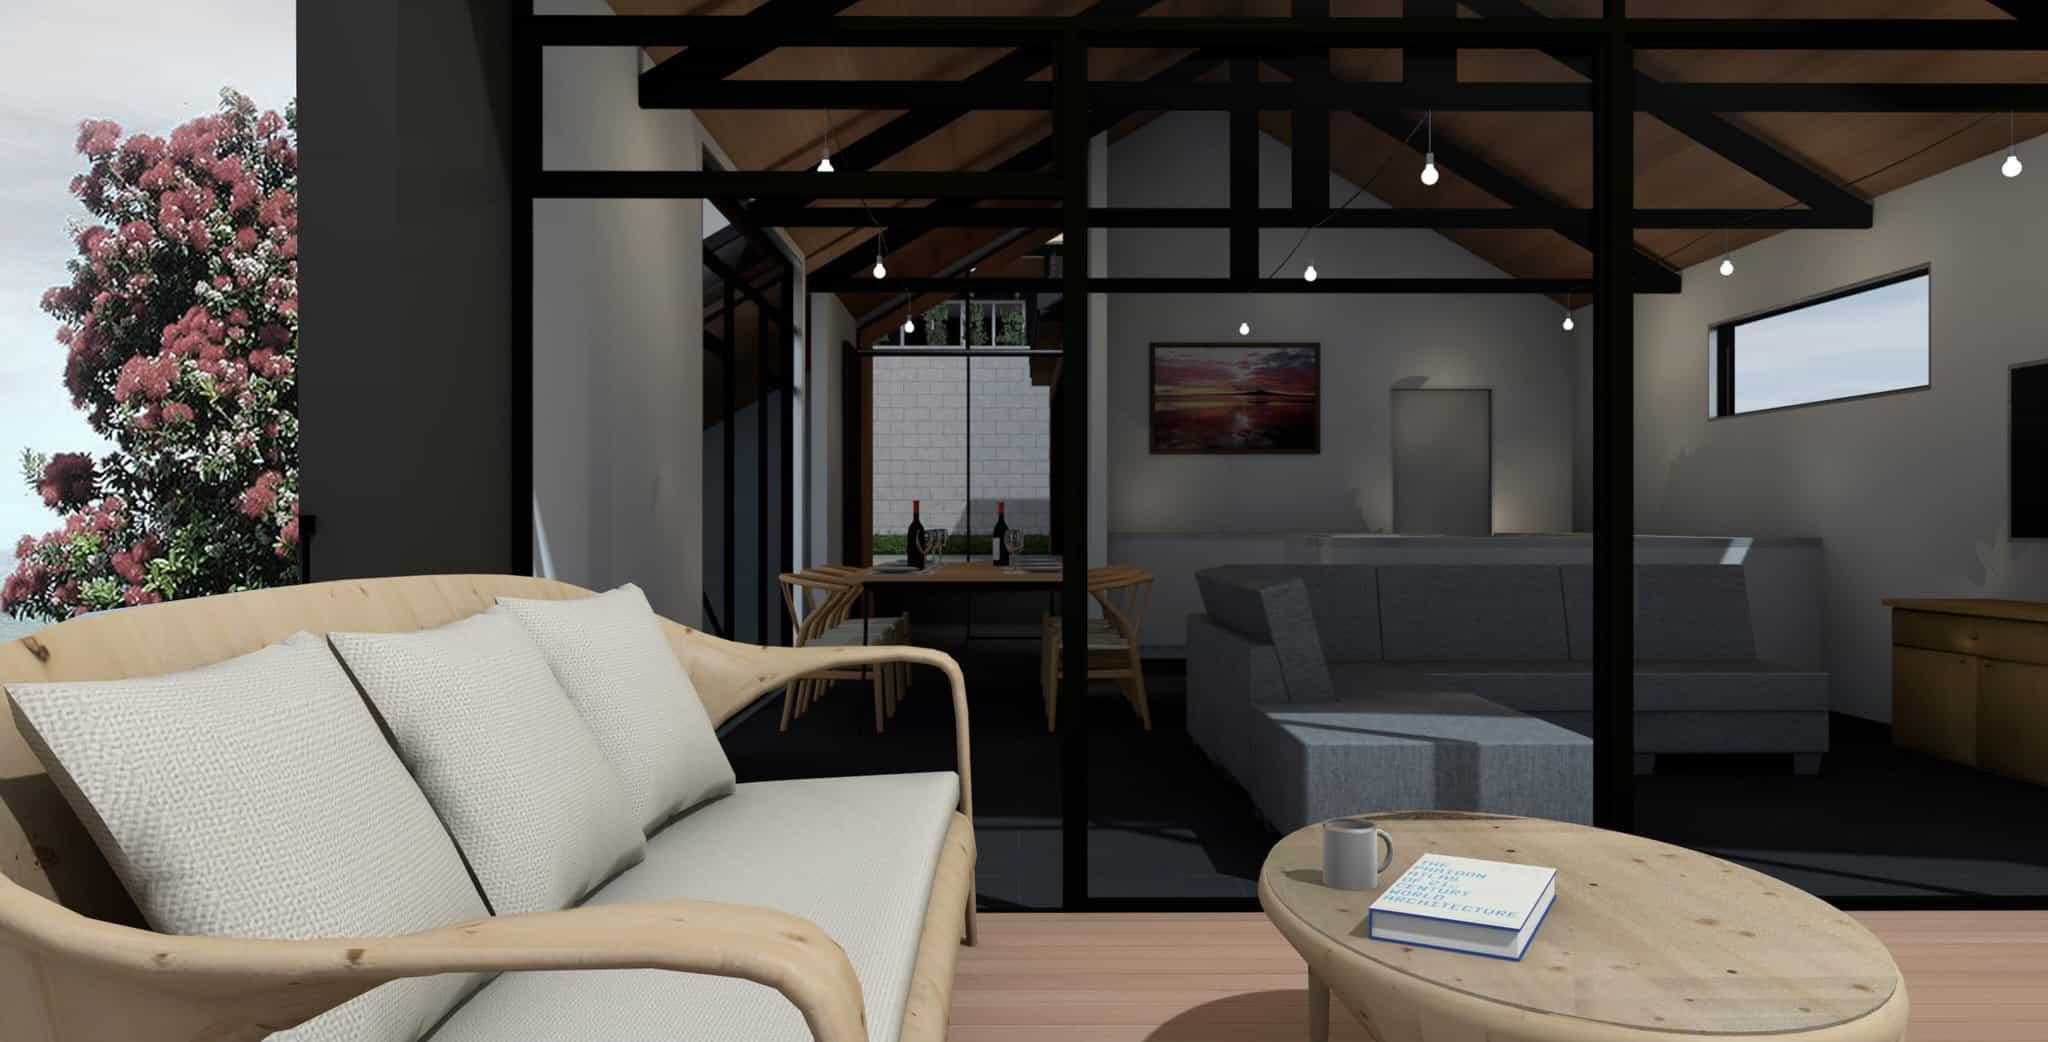 Estuary House - Exterior Render 2